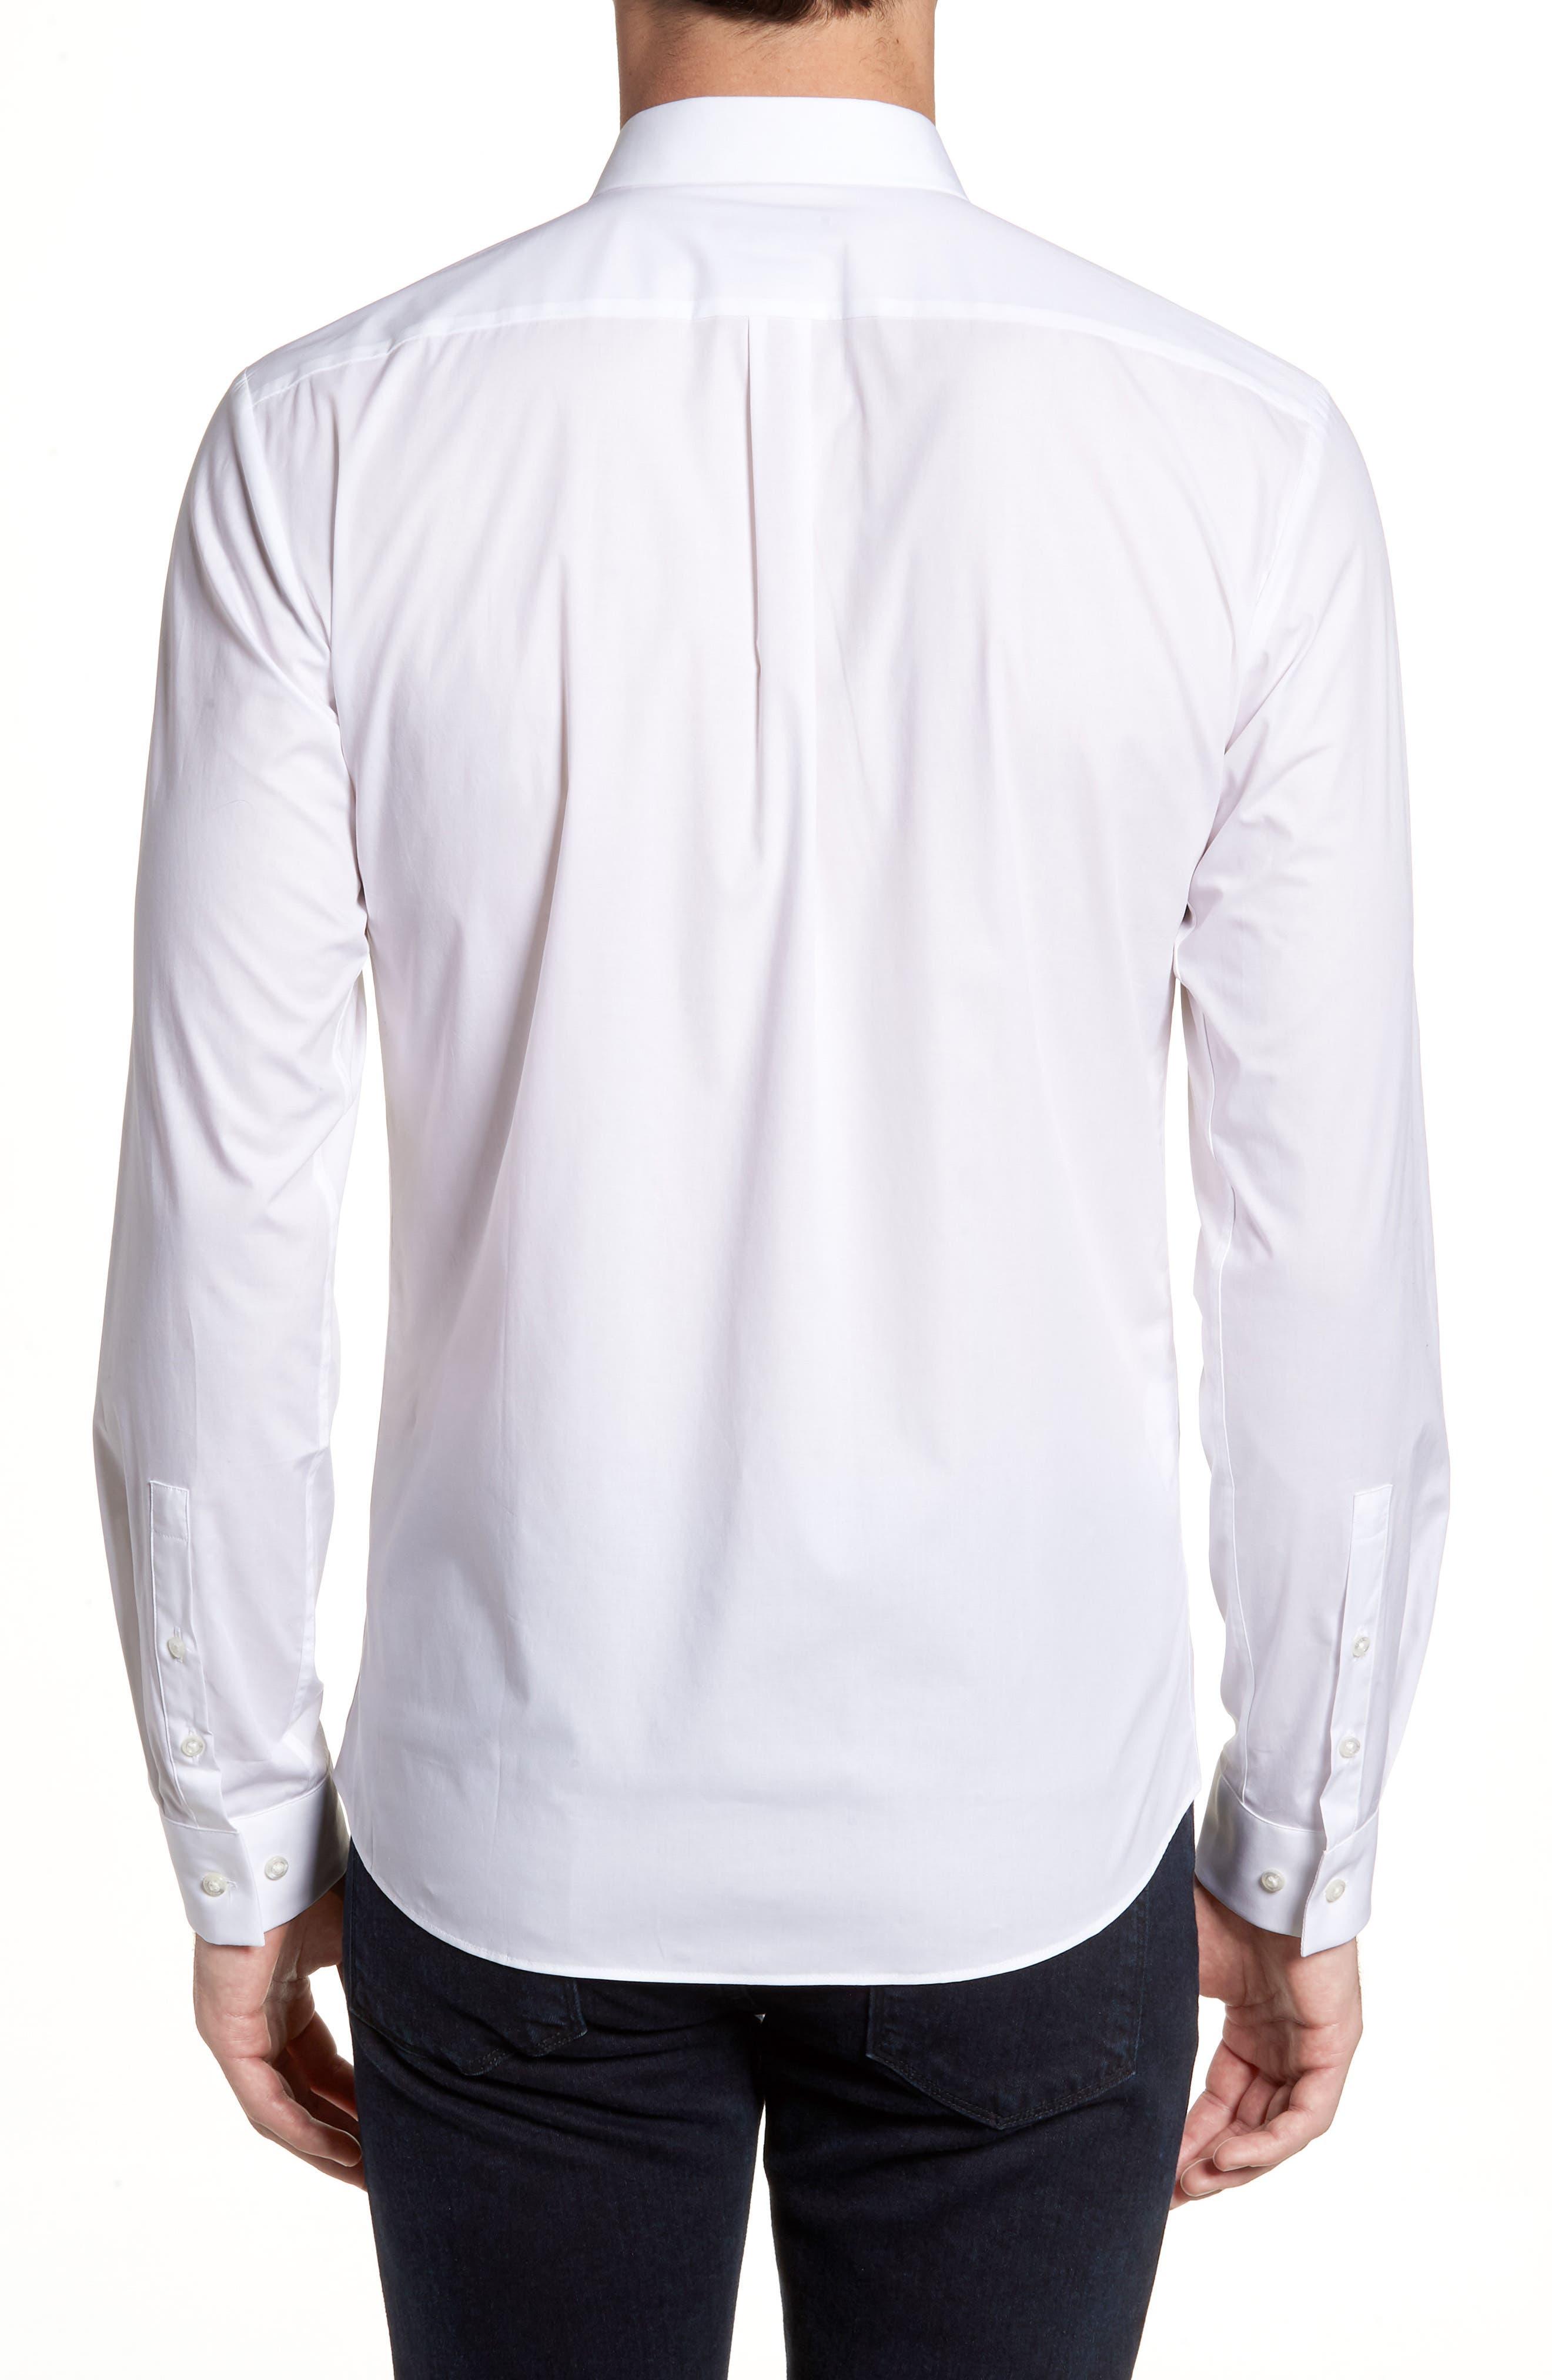 Ero3 Trim Fit Sport Shirt,                             Alternate thumbnail 2, color,                             White